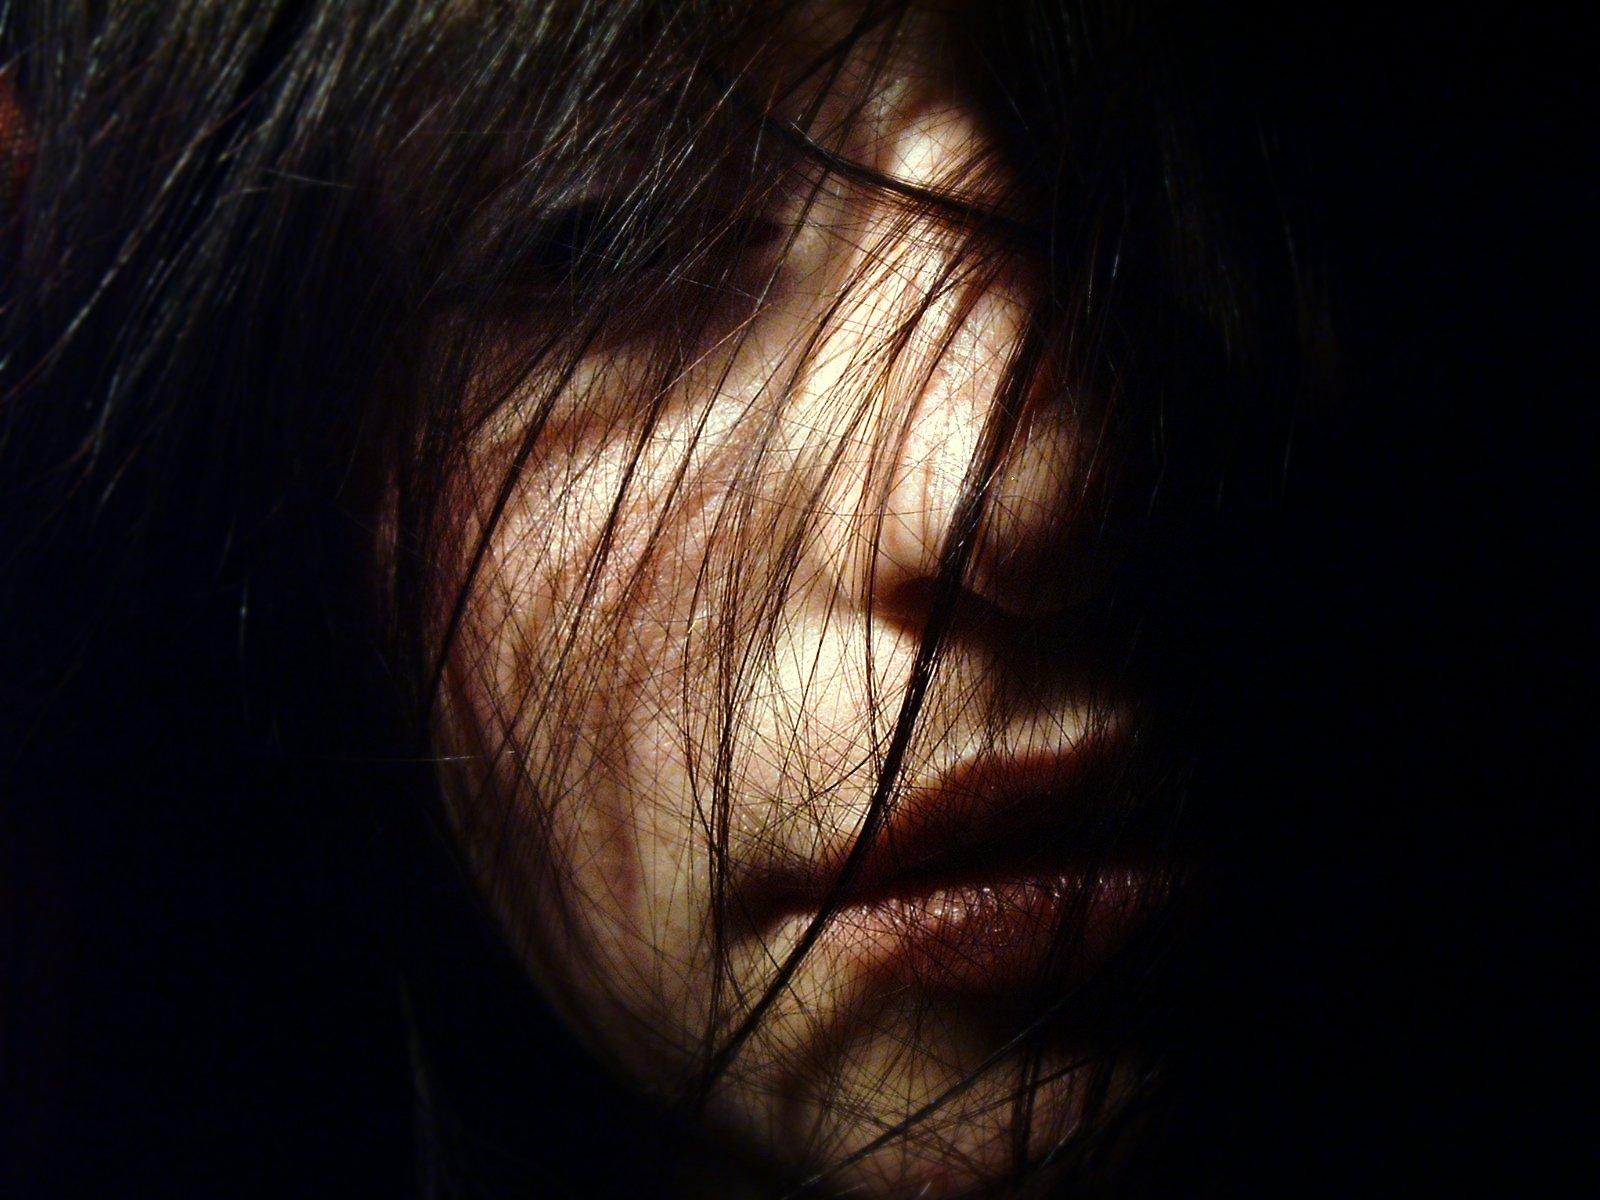 female-girl-teenager-teen-night-soft-dark-hard-light-lips-sensual-hair-people-person-nu-1454708